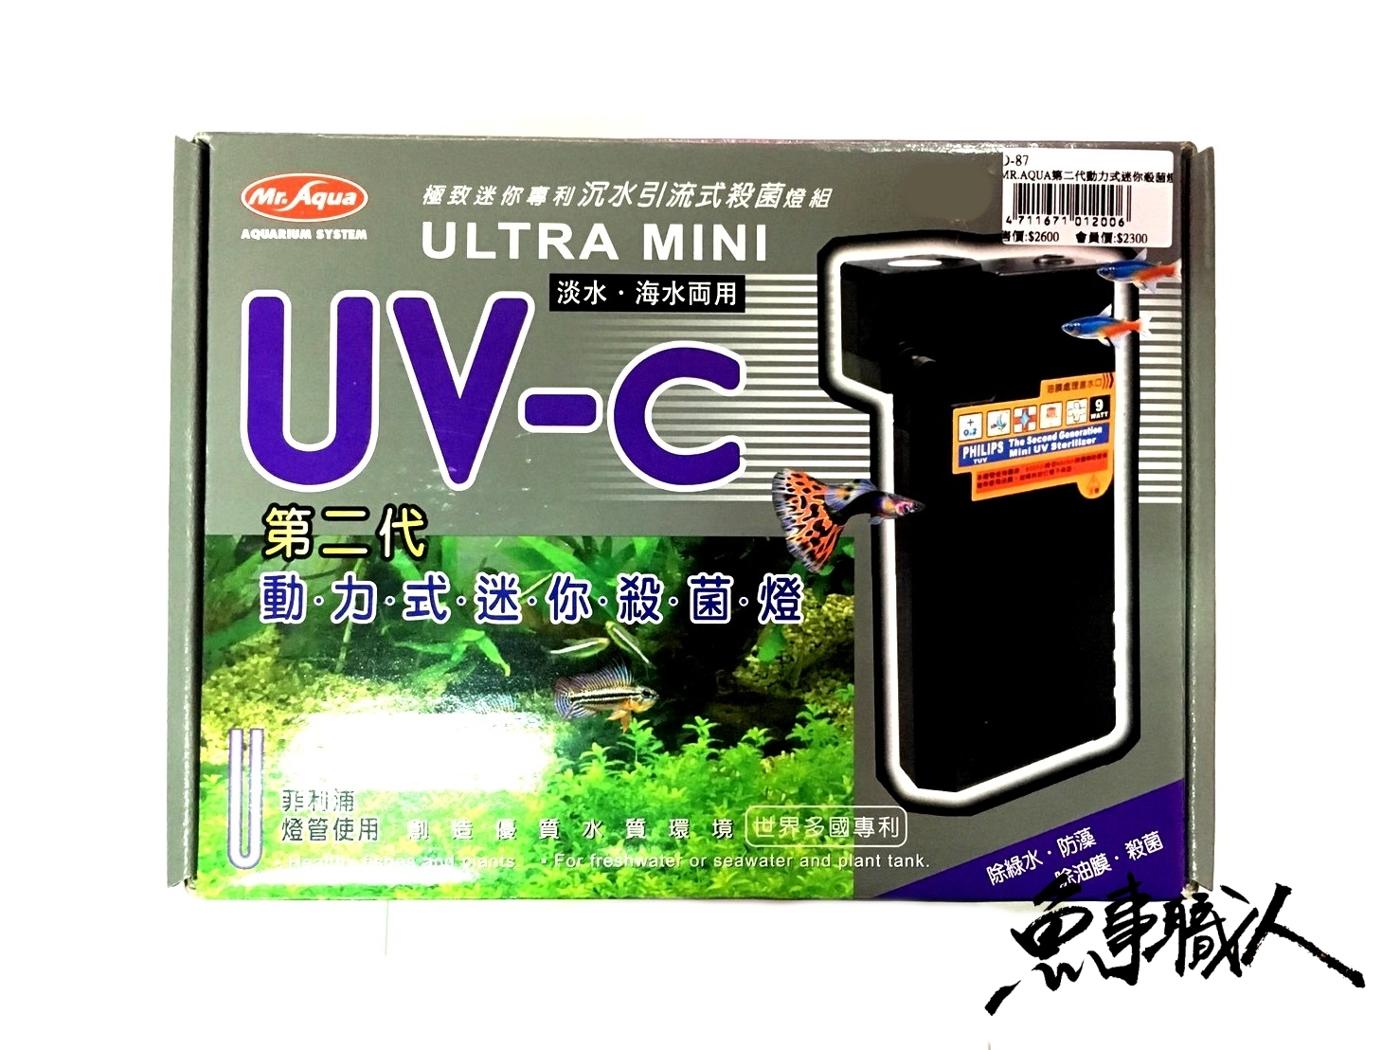 Mr.Aqua水族先生 UVC 二代動力殺菌燈 除綠水 綠藻 除油墨 油膜 水草 殺菌 淨水 魚事職人